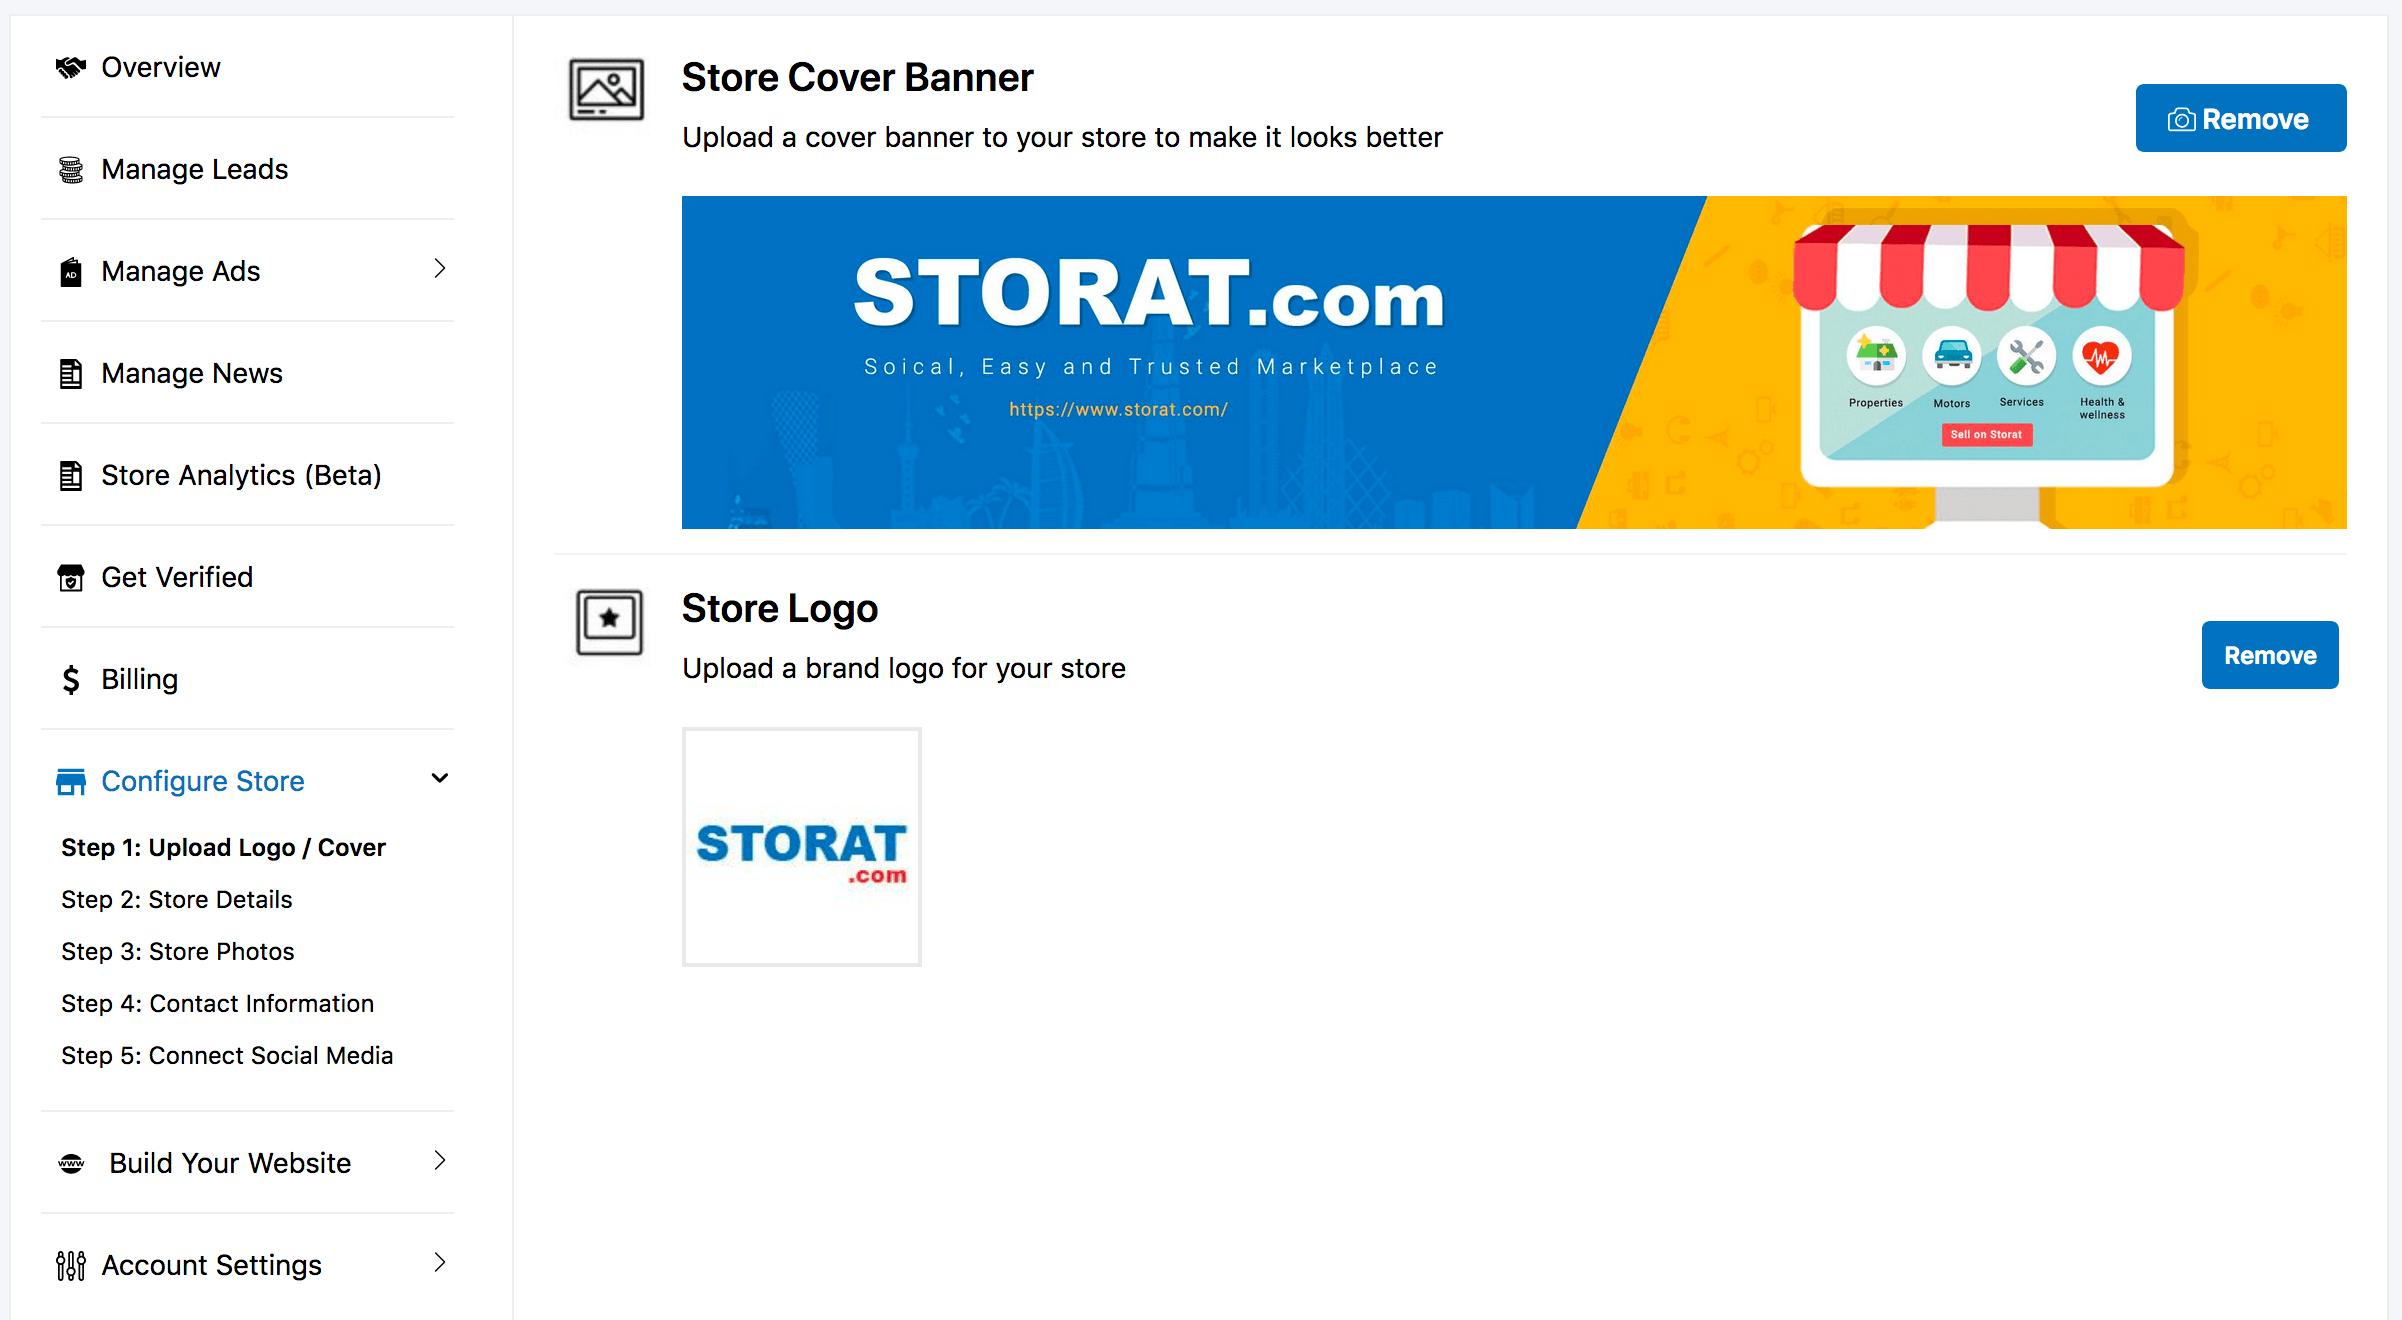 Configure Store at Storat.com